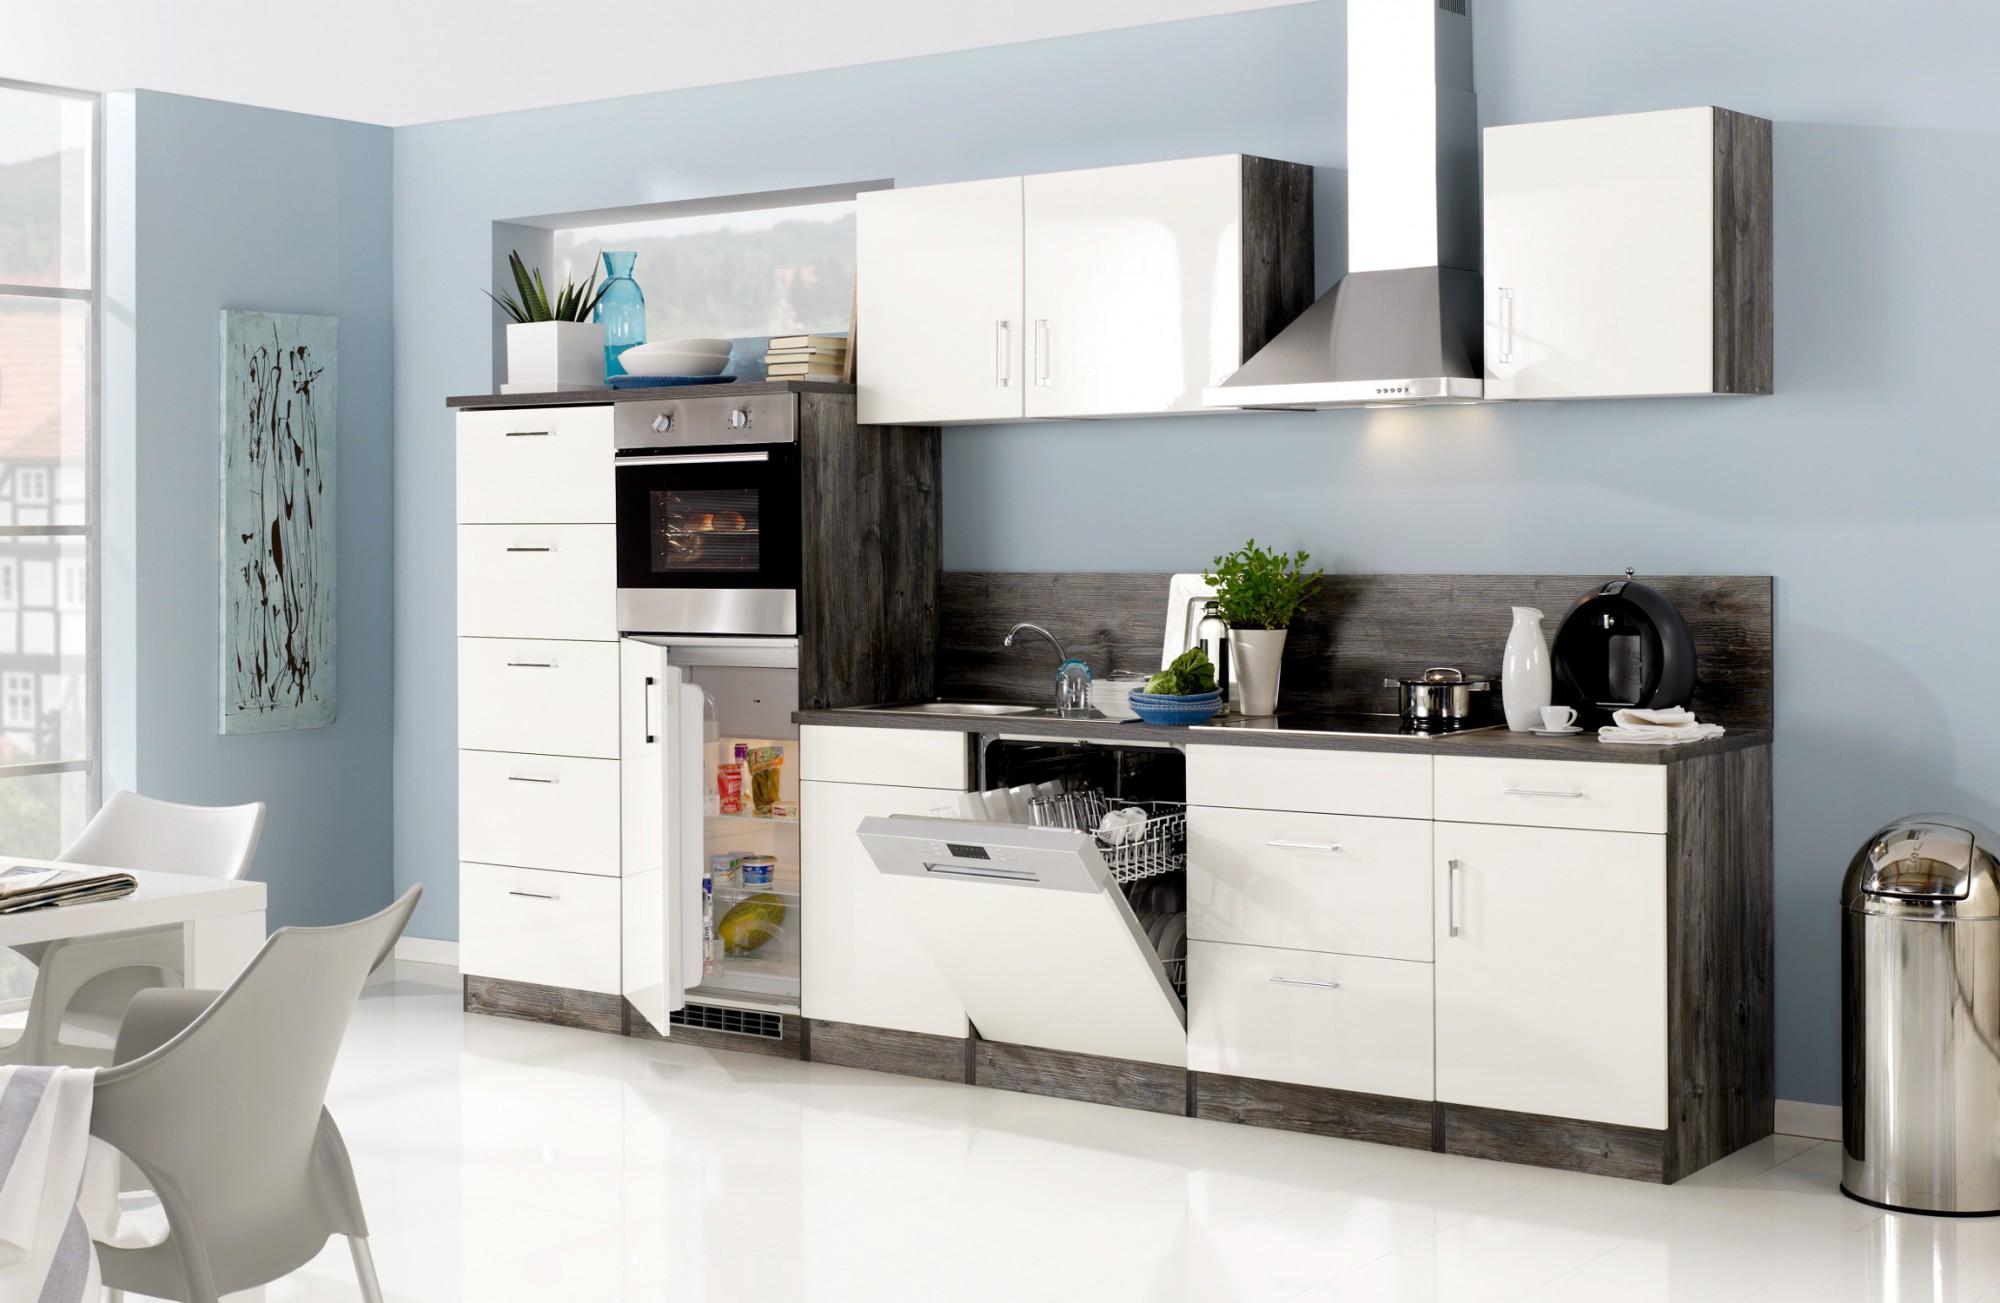 Full Size of Küche Mit E Geräten L Form Küche Mit E Geräten Höffner Küche Mit E Geräten Billig Küche Mit E Geräten Real Küche Einbauküche Mit E Geräten